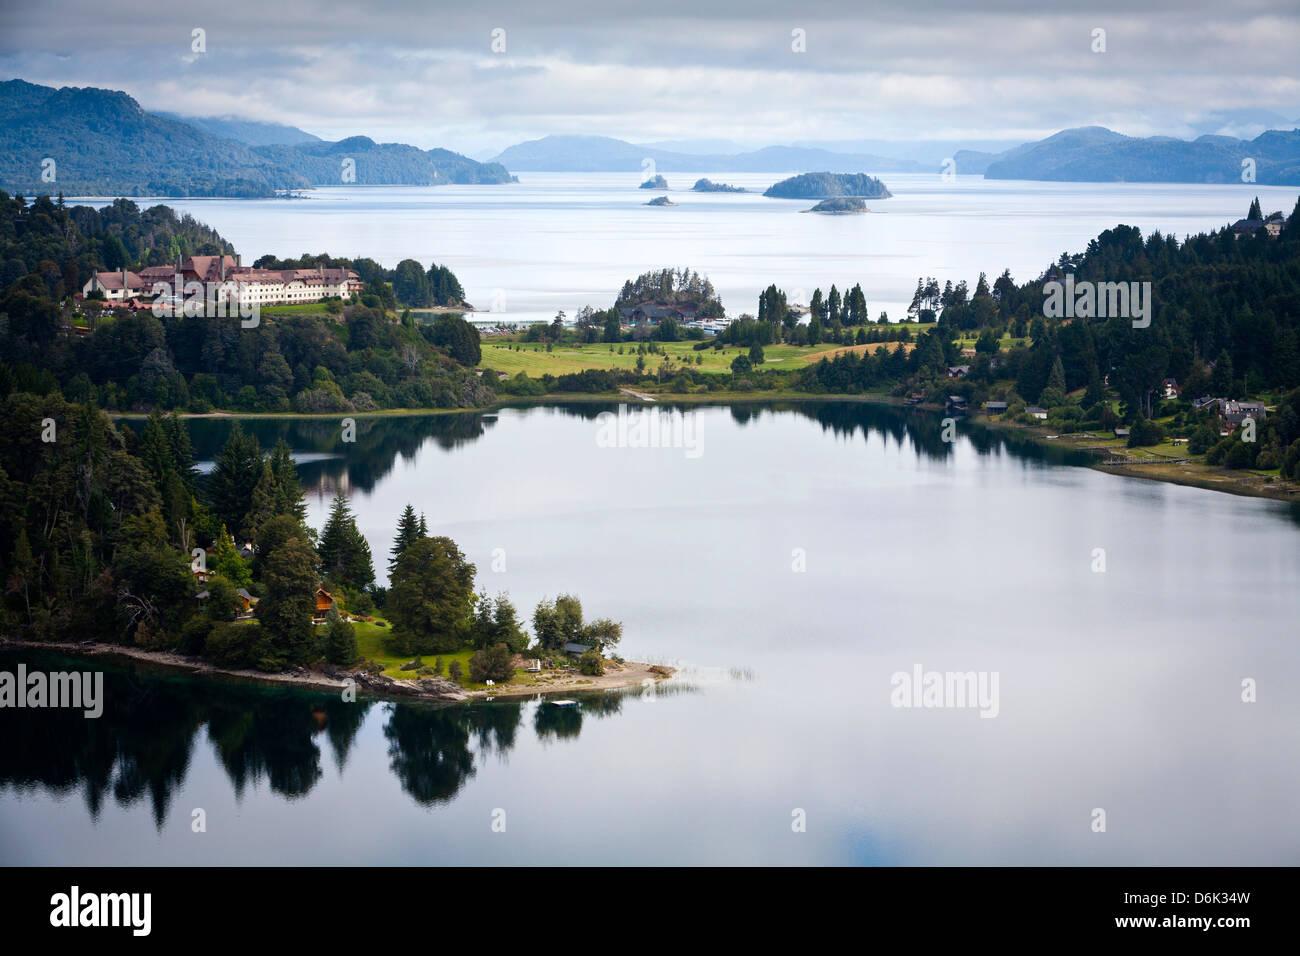 View over Nahuel Huapi lake and Llao Llao hotel near Bariloche, Lake District, Patagonia, Argentina, South America - Stock Image